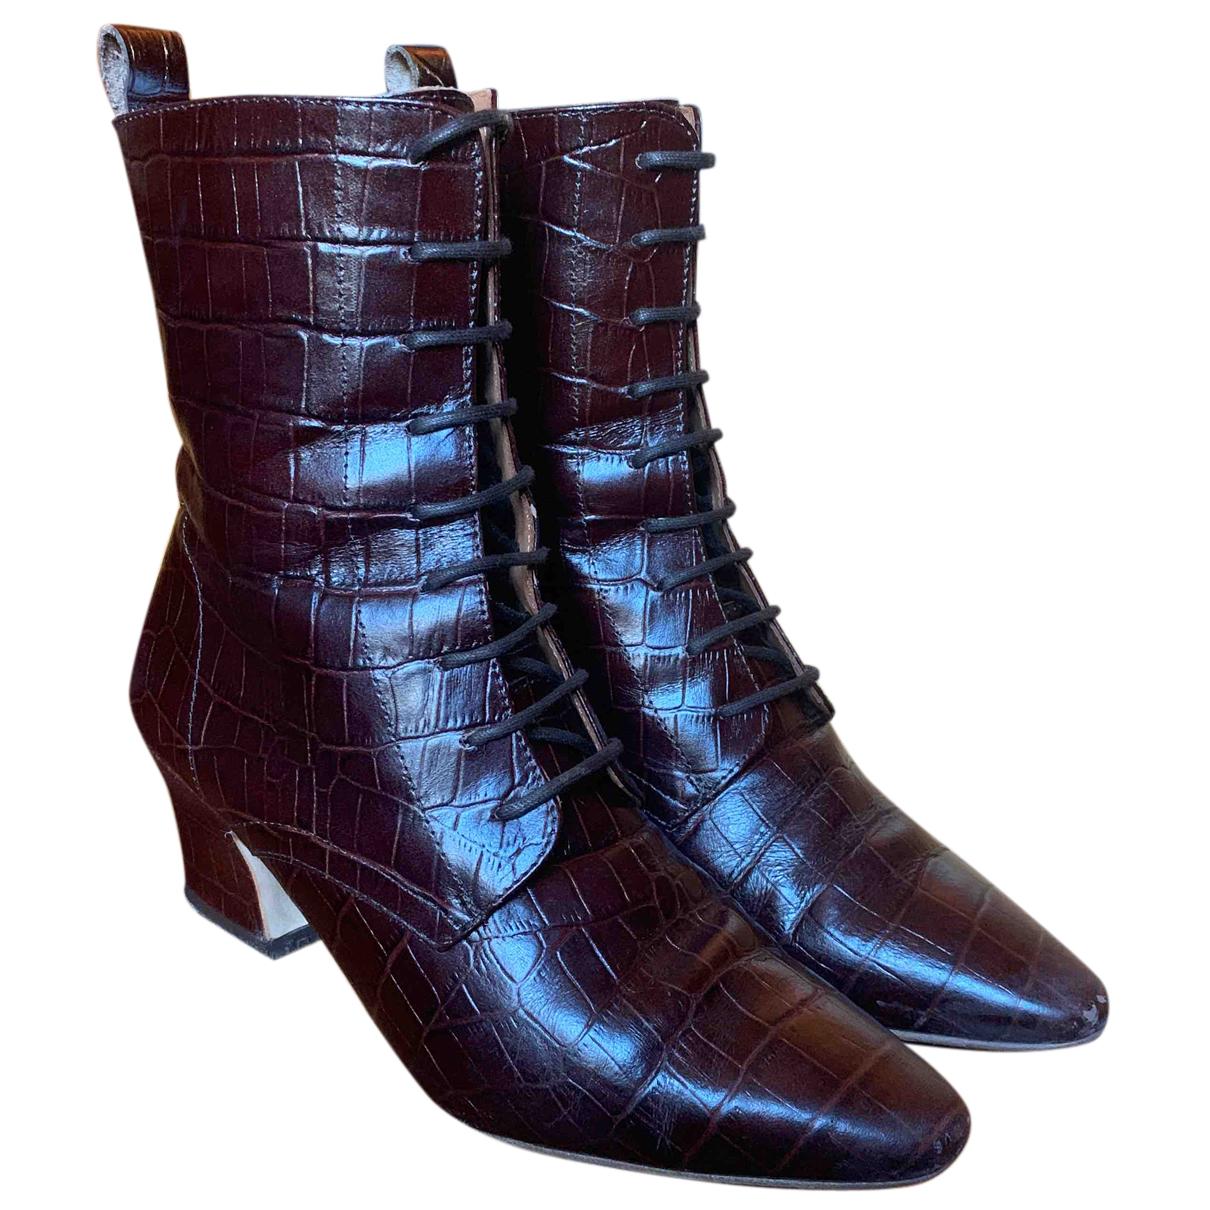 Miista N Brown Leather Boots for Women 36 EU